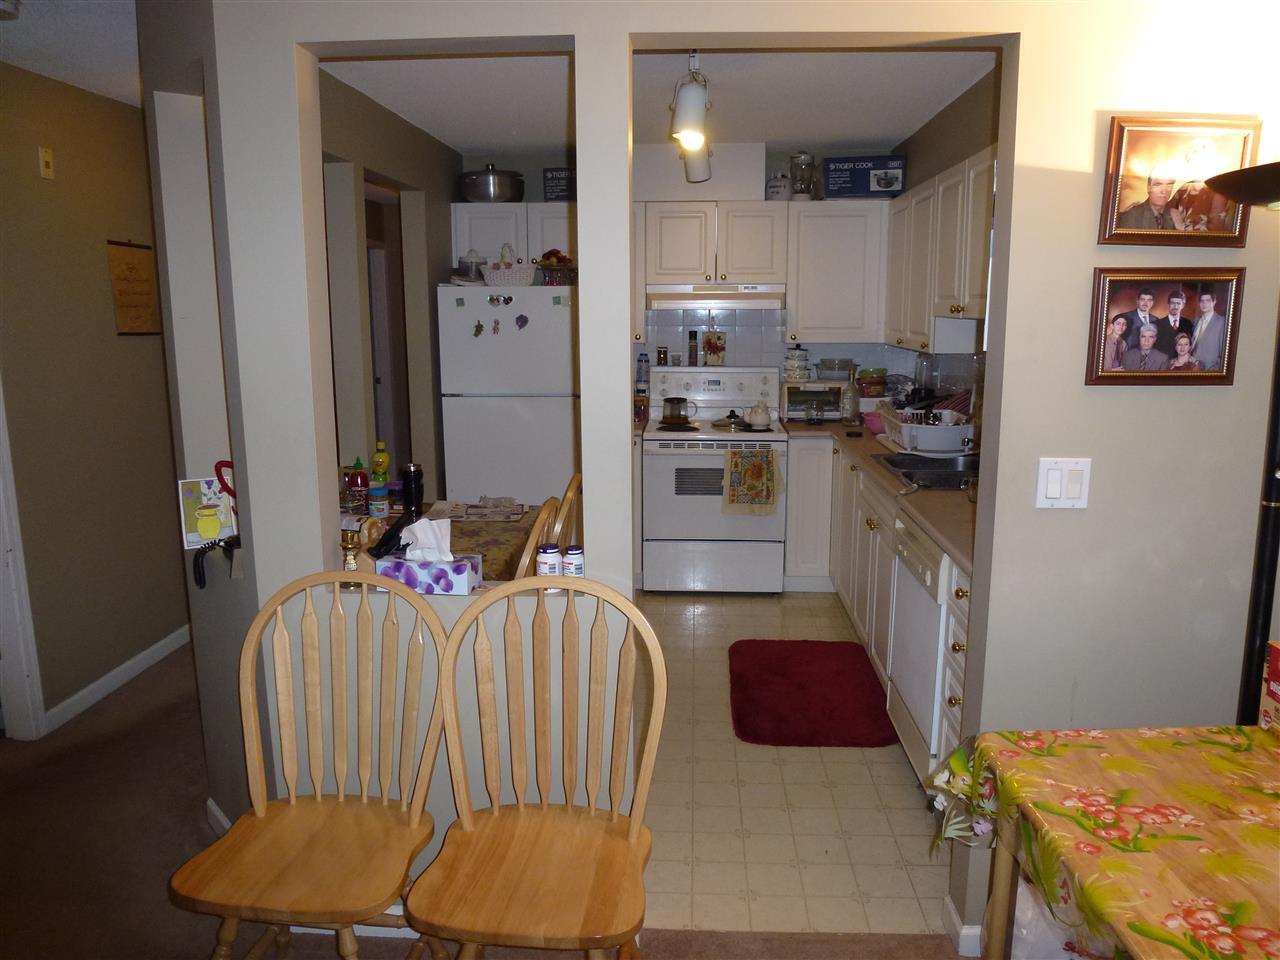 "Photo 8: Photos: 323 2678 DIXON Street in Port Coquitlam: Central Pt Coquitlam Condo for sale in ""SPRINGDALE"" : MLS®# R2041724"